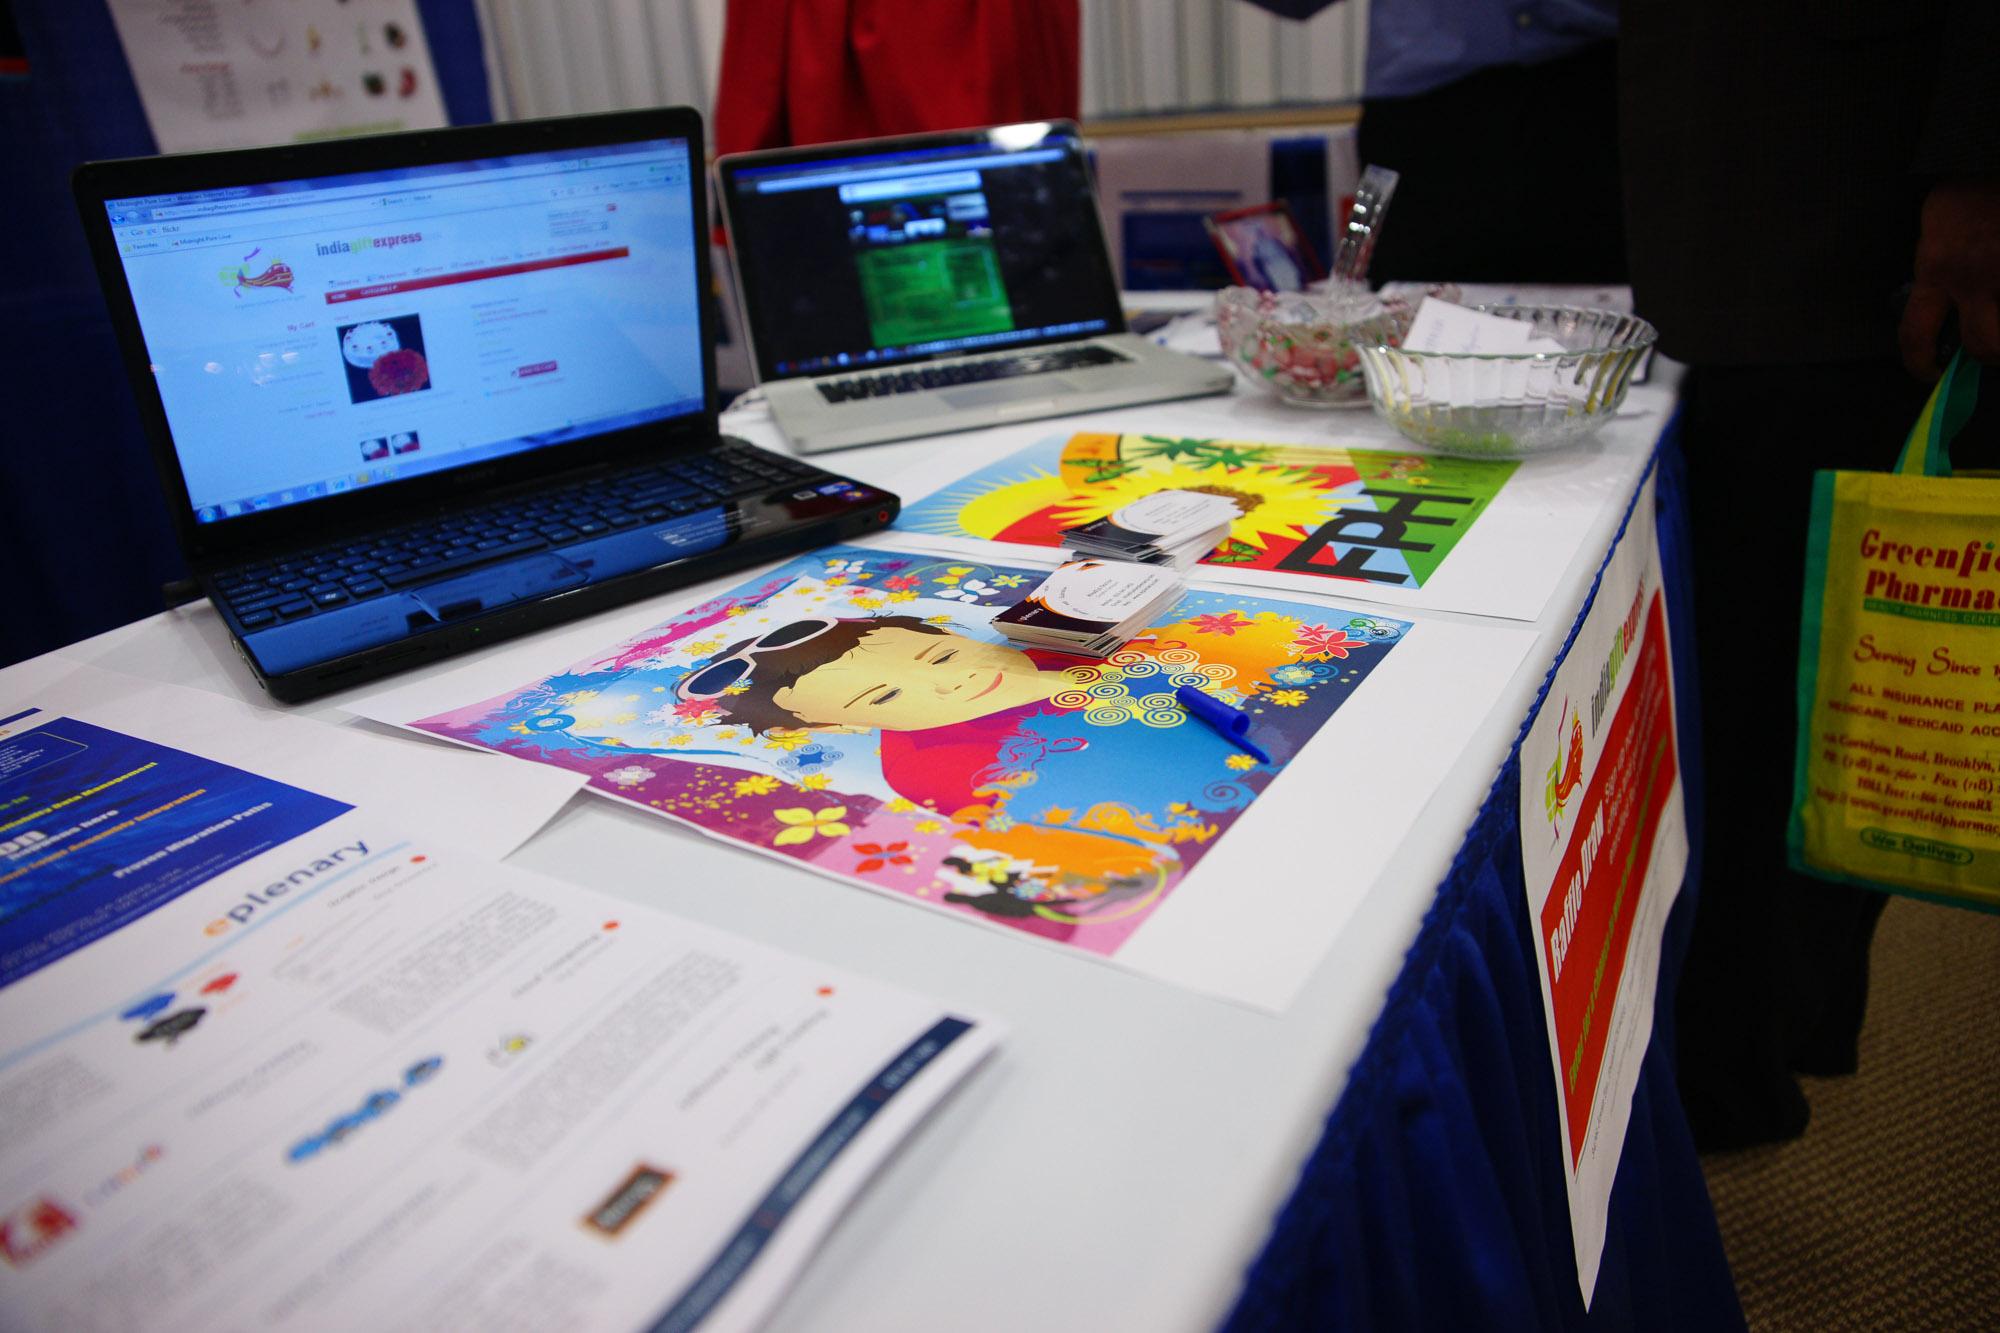 BBCC Houston Business Expo 2011album-16975646-downloads-pt4-22.JPG